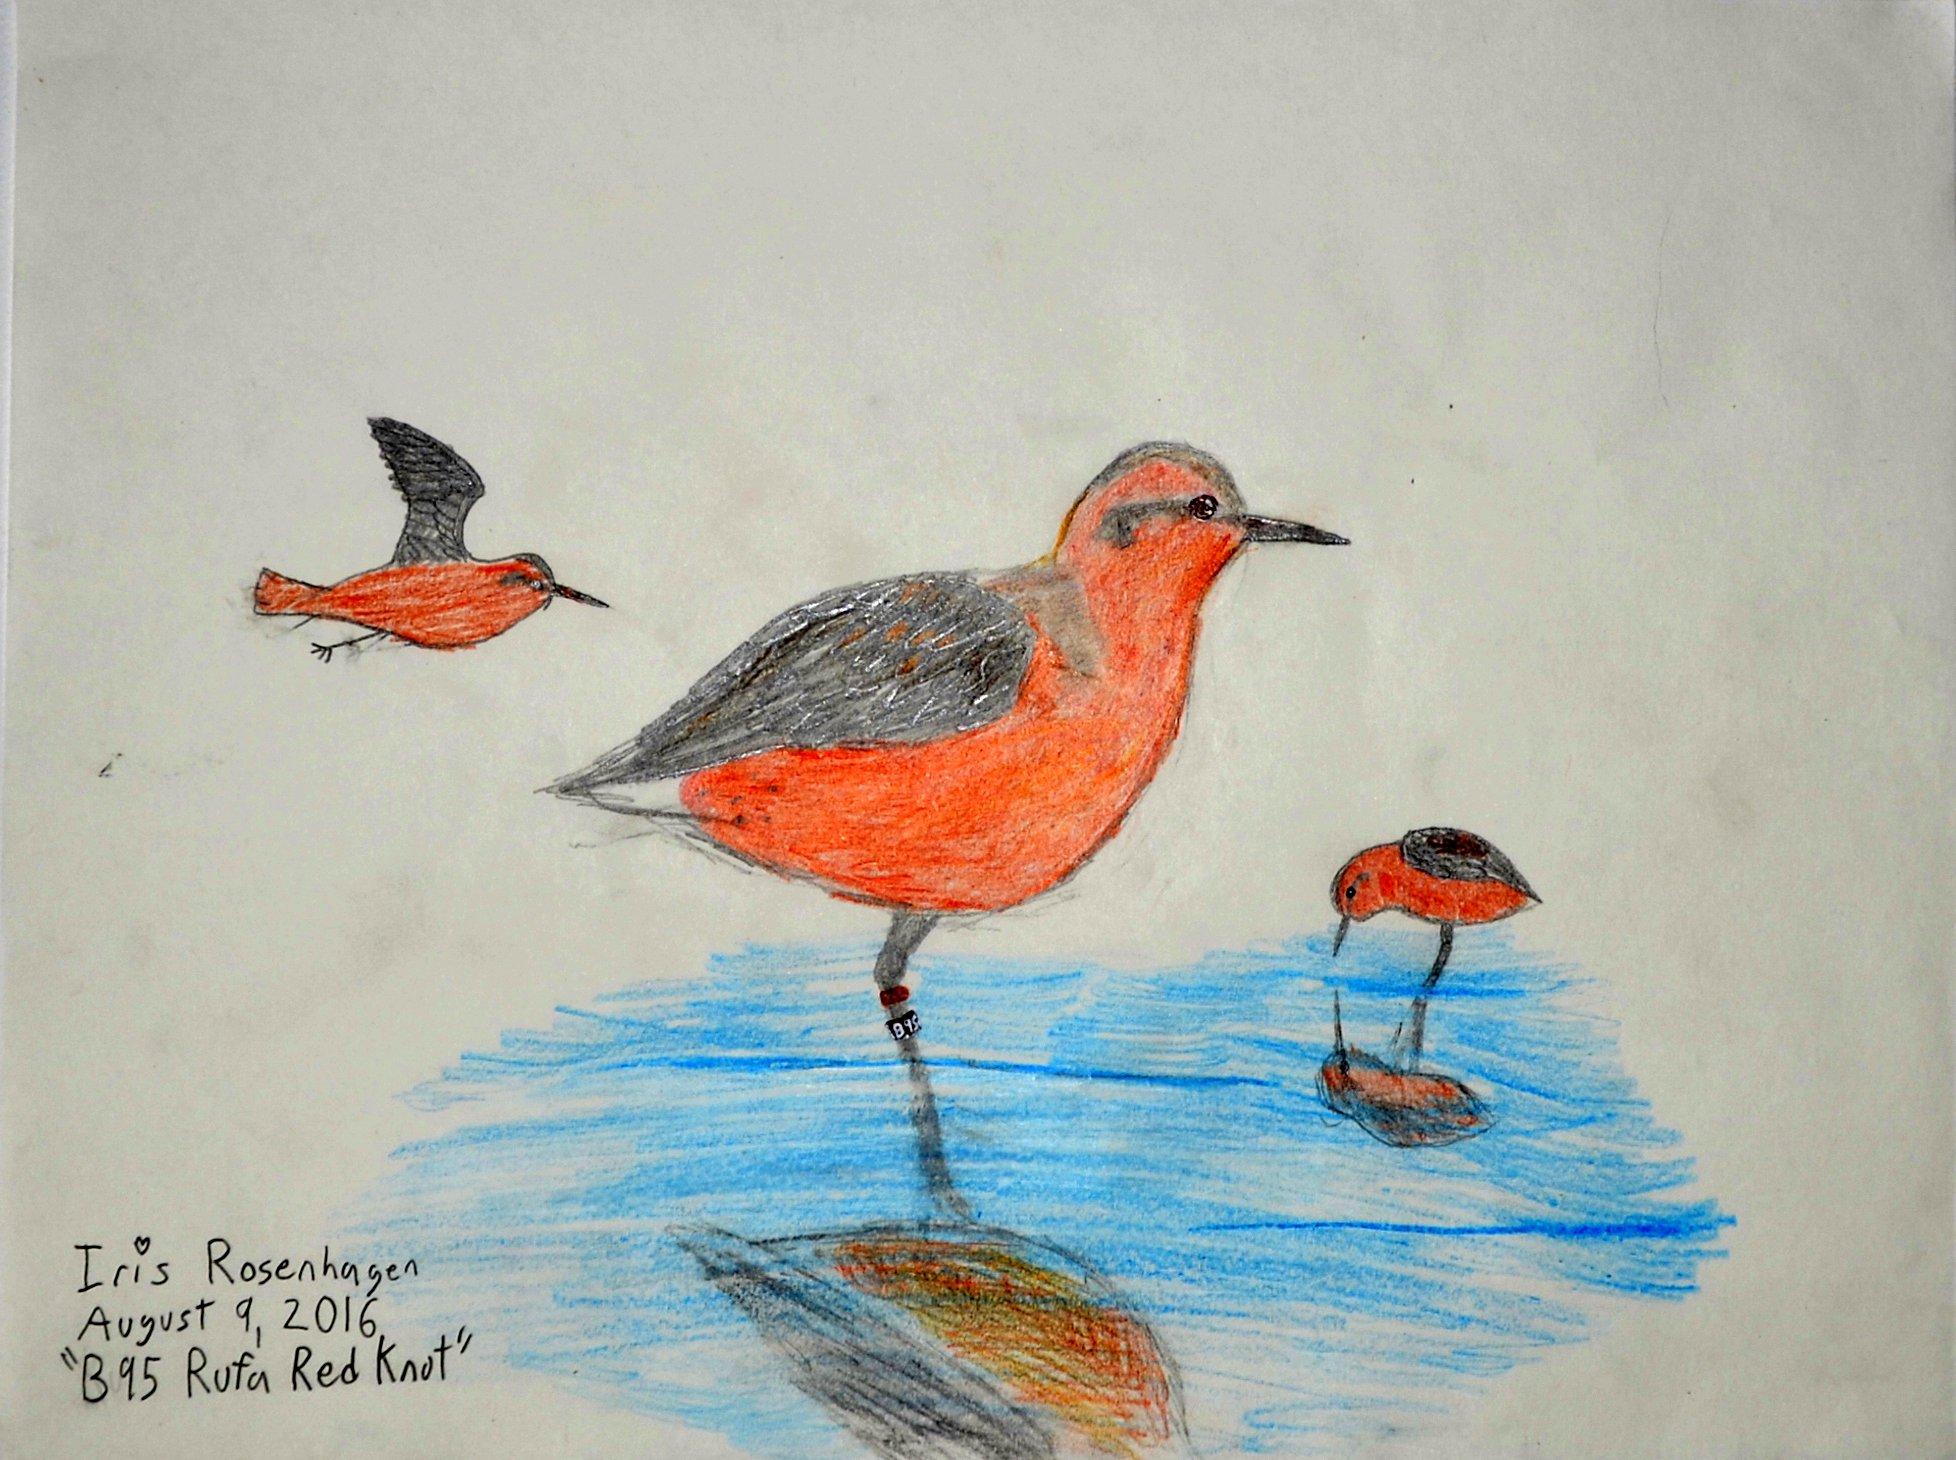 Iris Rosenhagen, Red Knot, Age 11